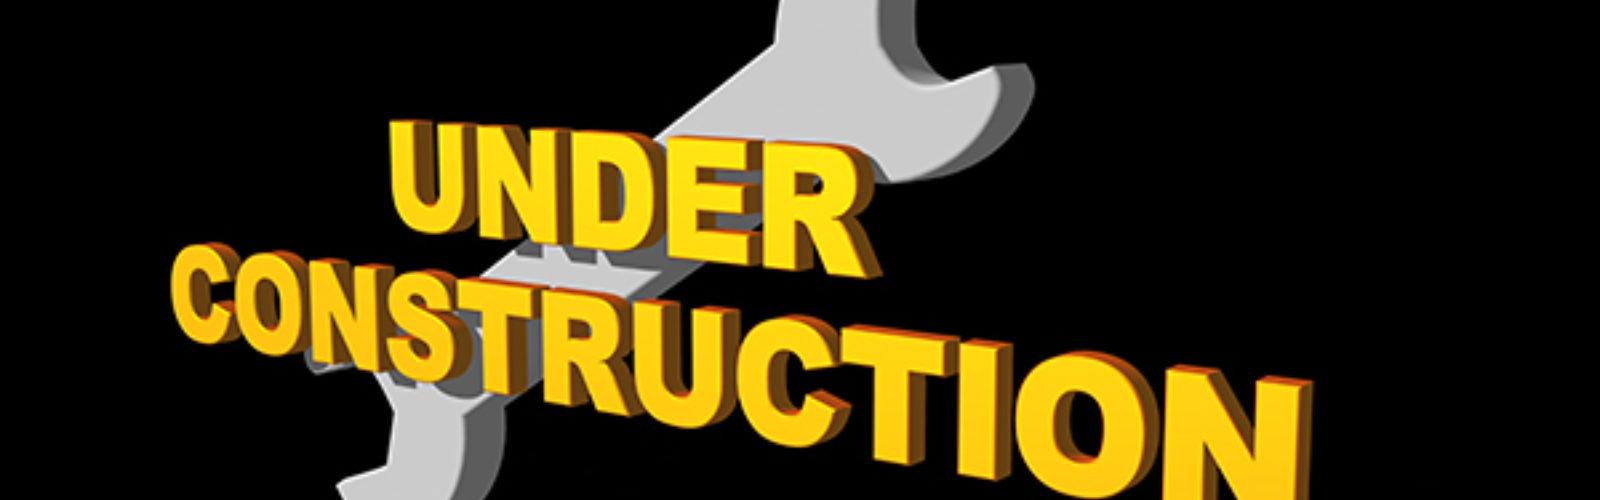 Under-Contsruction (bs3274655)_.jpg